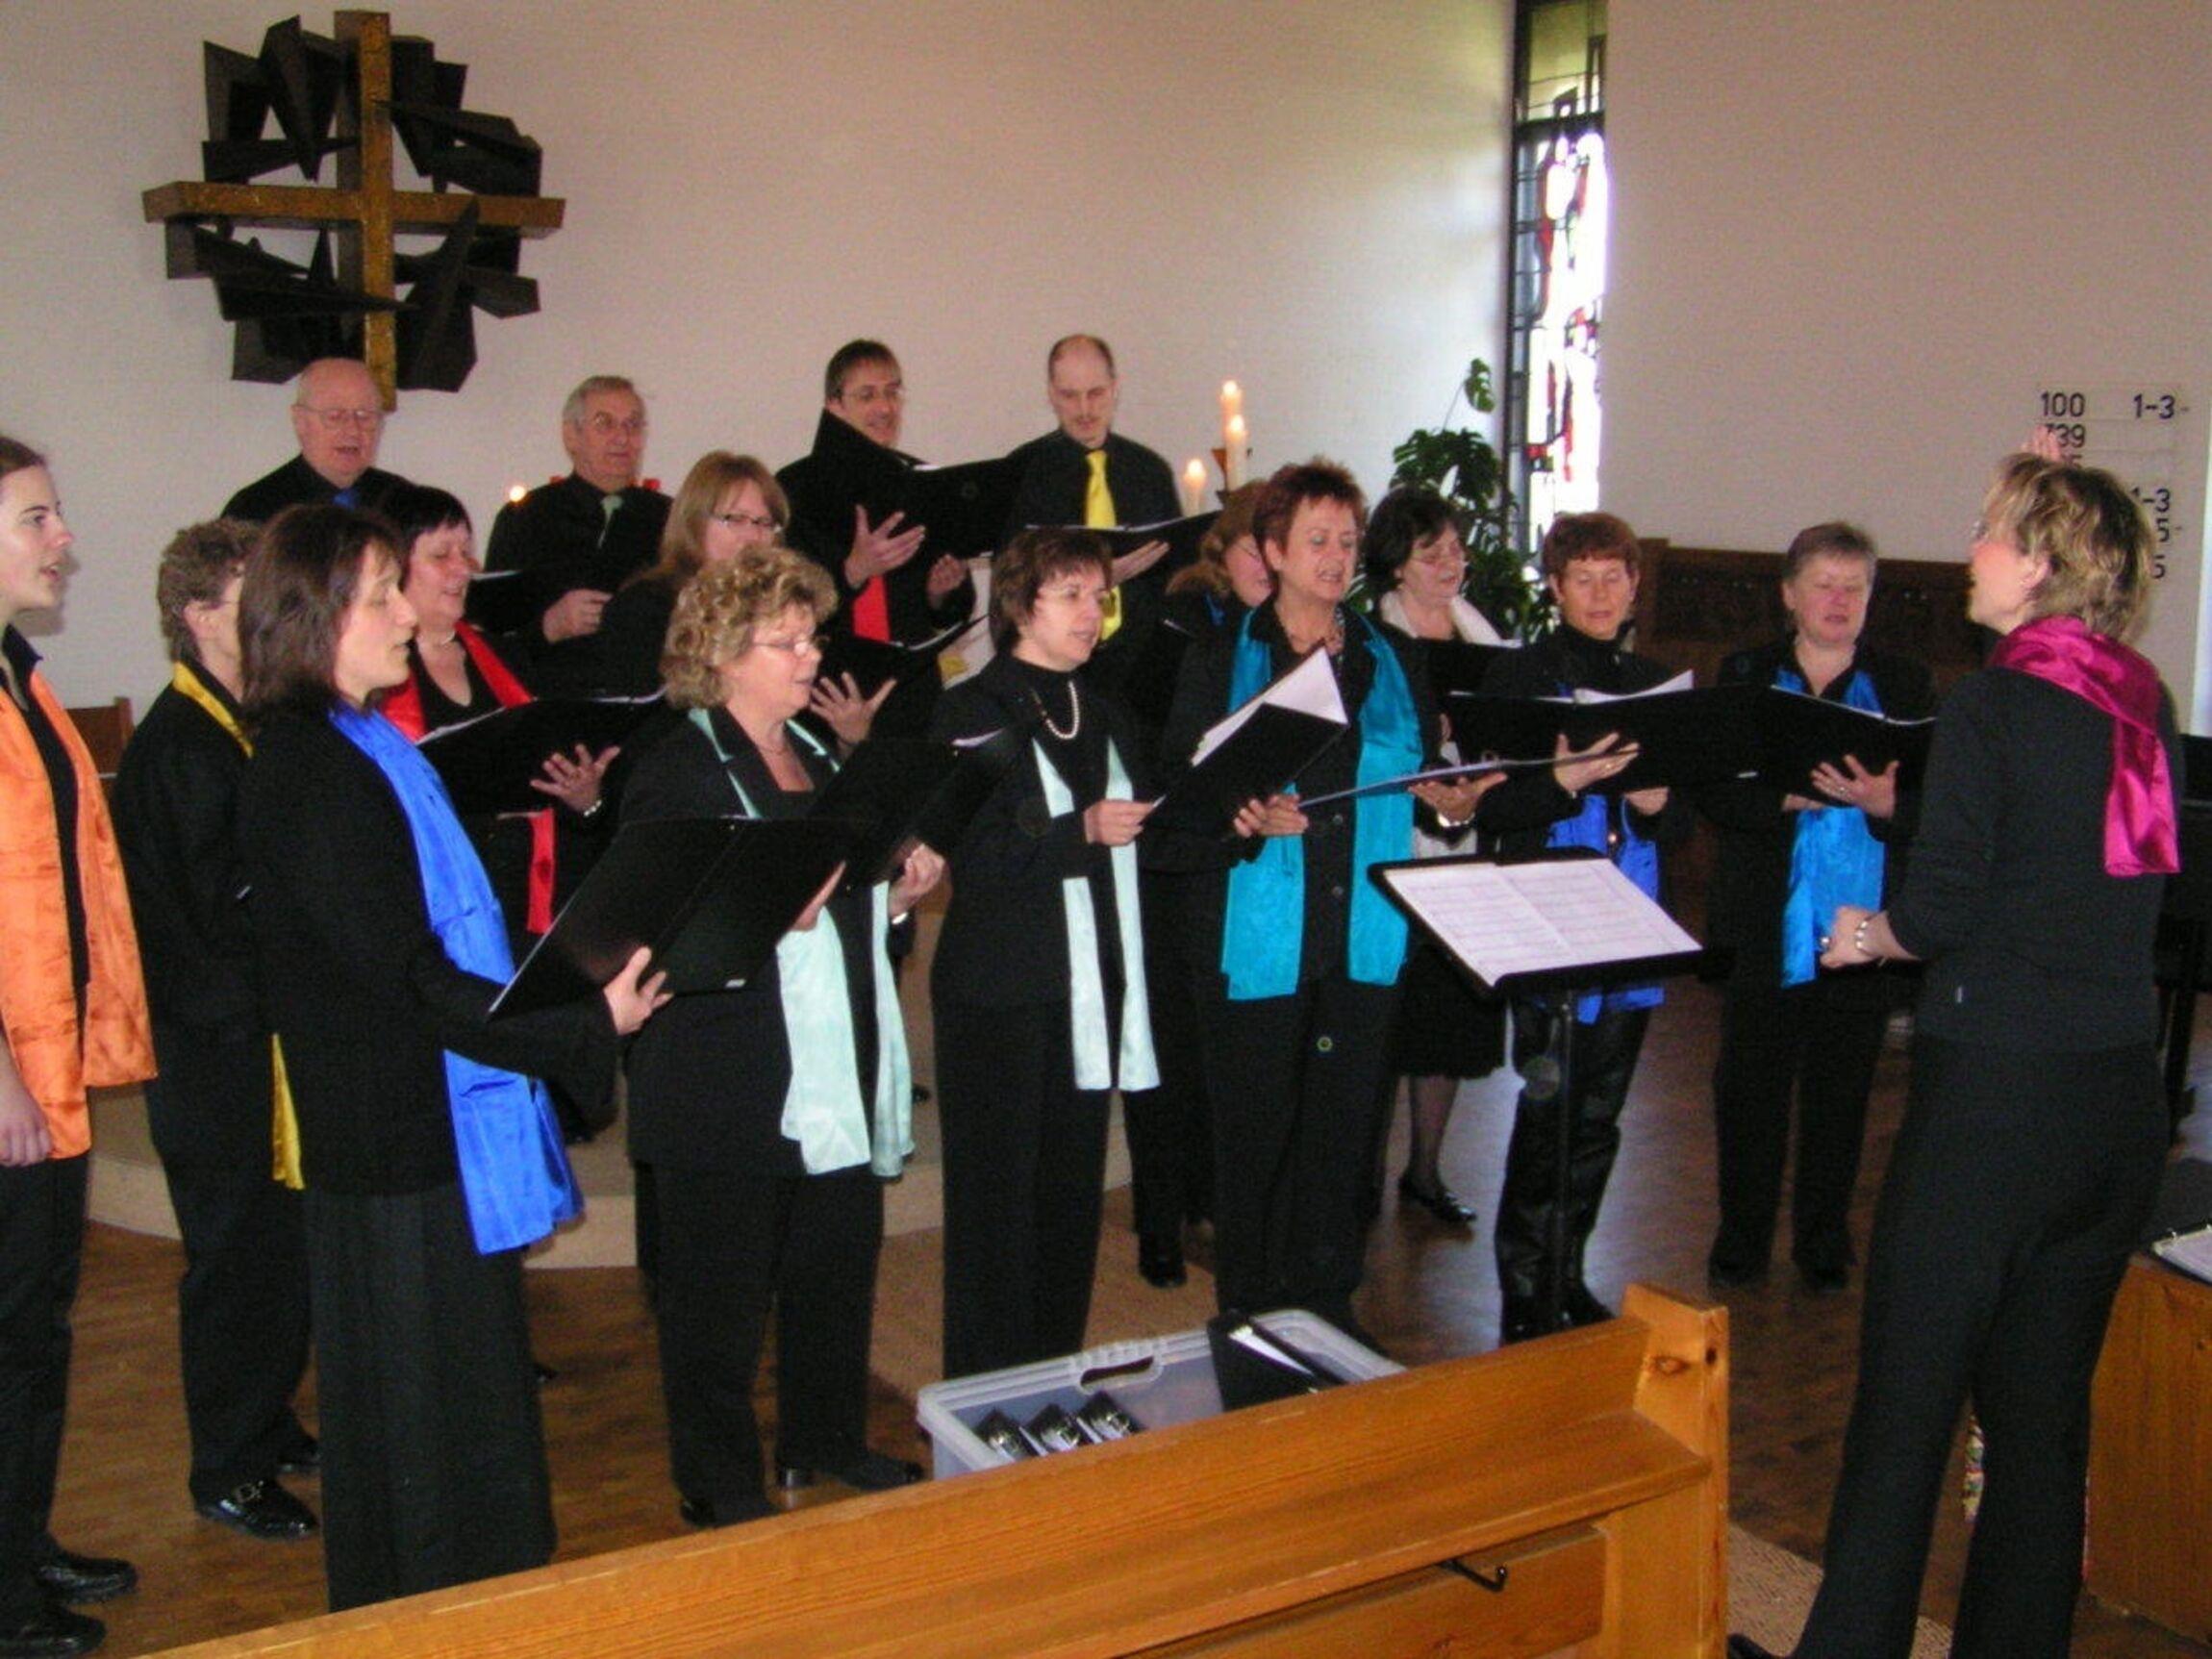 Kirchenchor P1030782-3